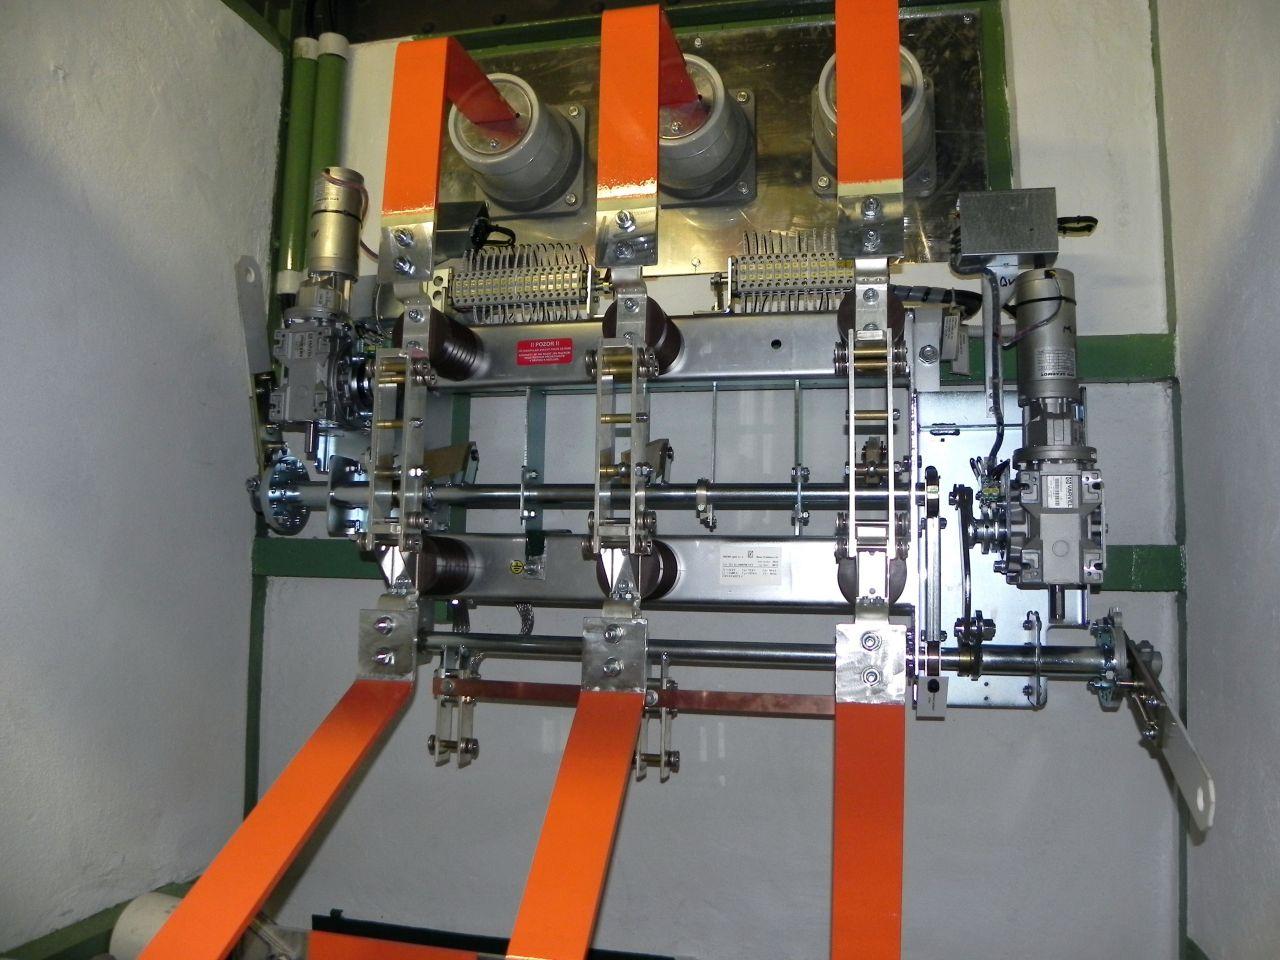 Motor Operated Drives Vm10 And Vm50 Dribo Spol S R O